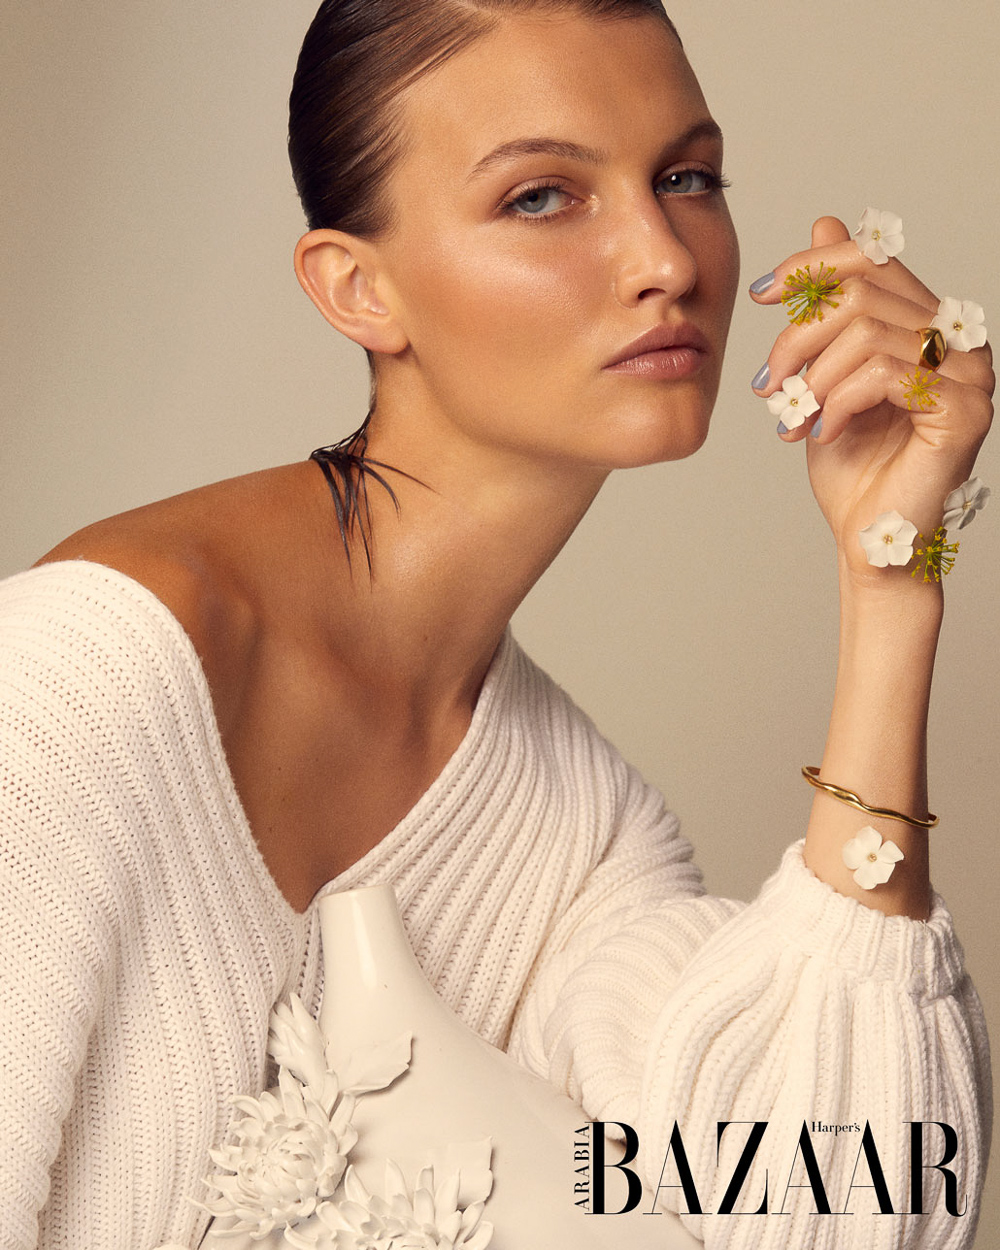 Photo of Frauke Fischer for Harper's Bazaar Arabia with Hilal Ata | Fashion Editorials